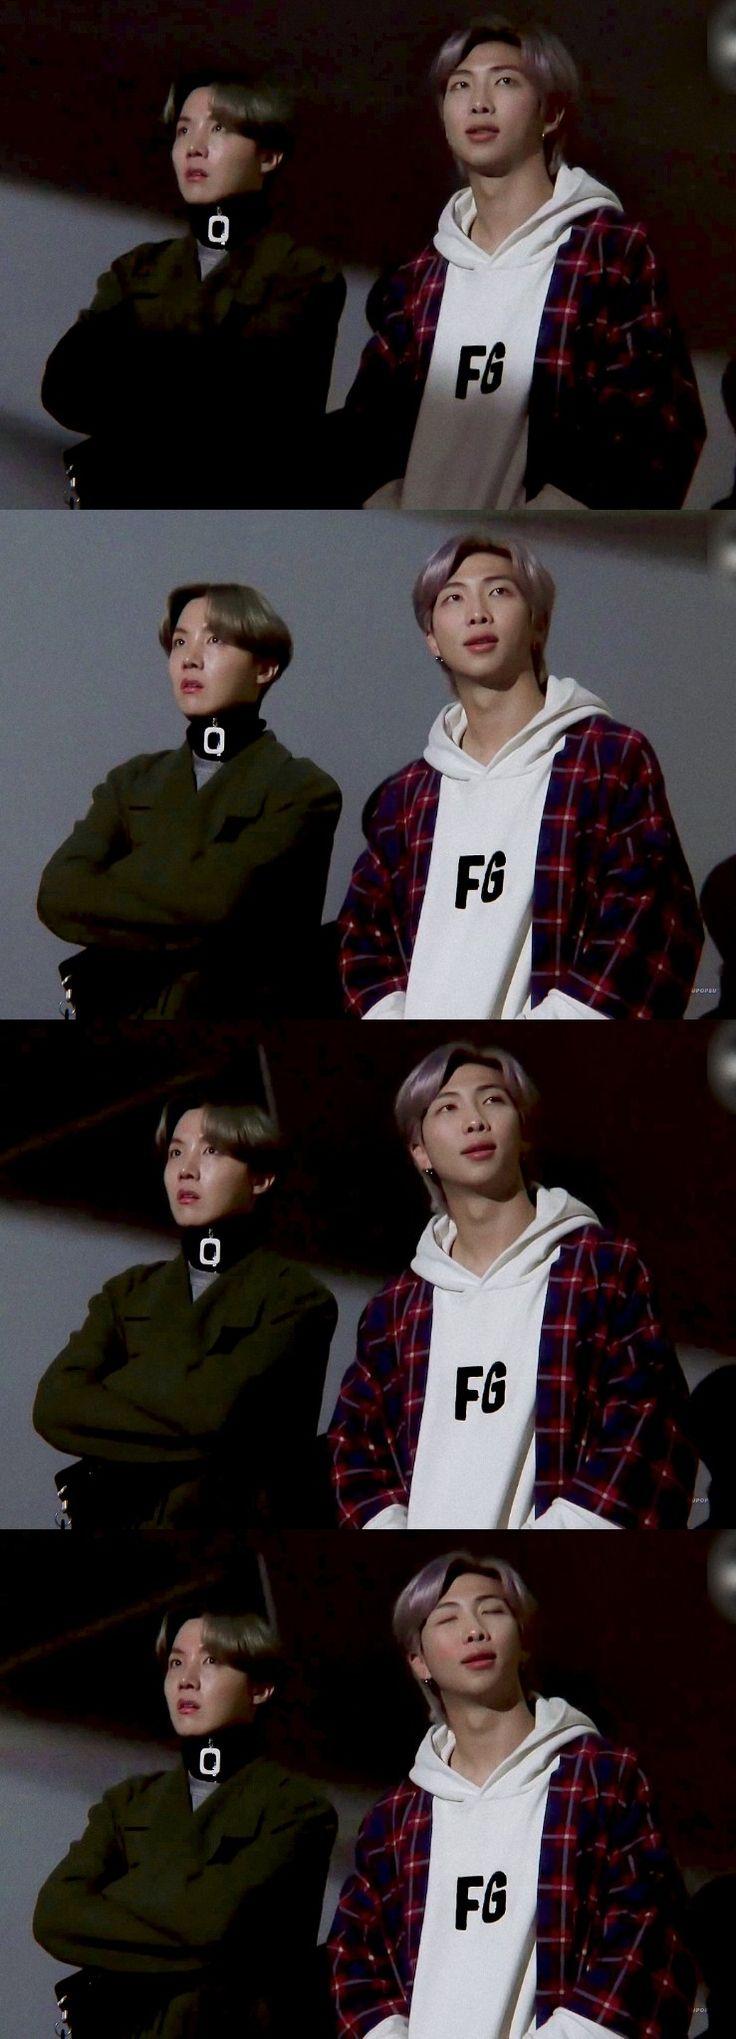 Pin de Park Jimin 13 🍊 em BTS 방탄소년단 em 2020 K pop